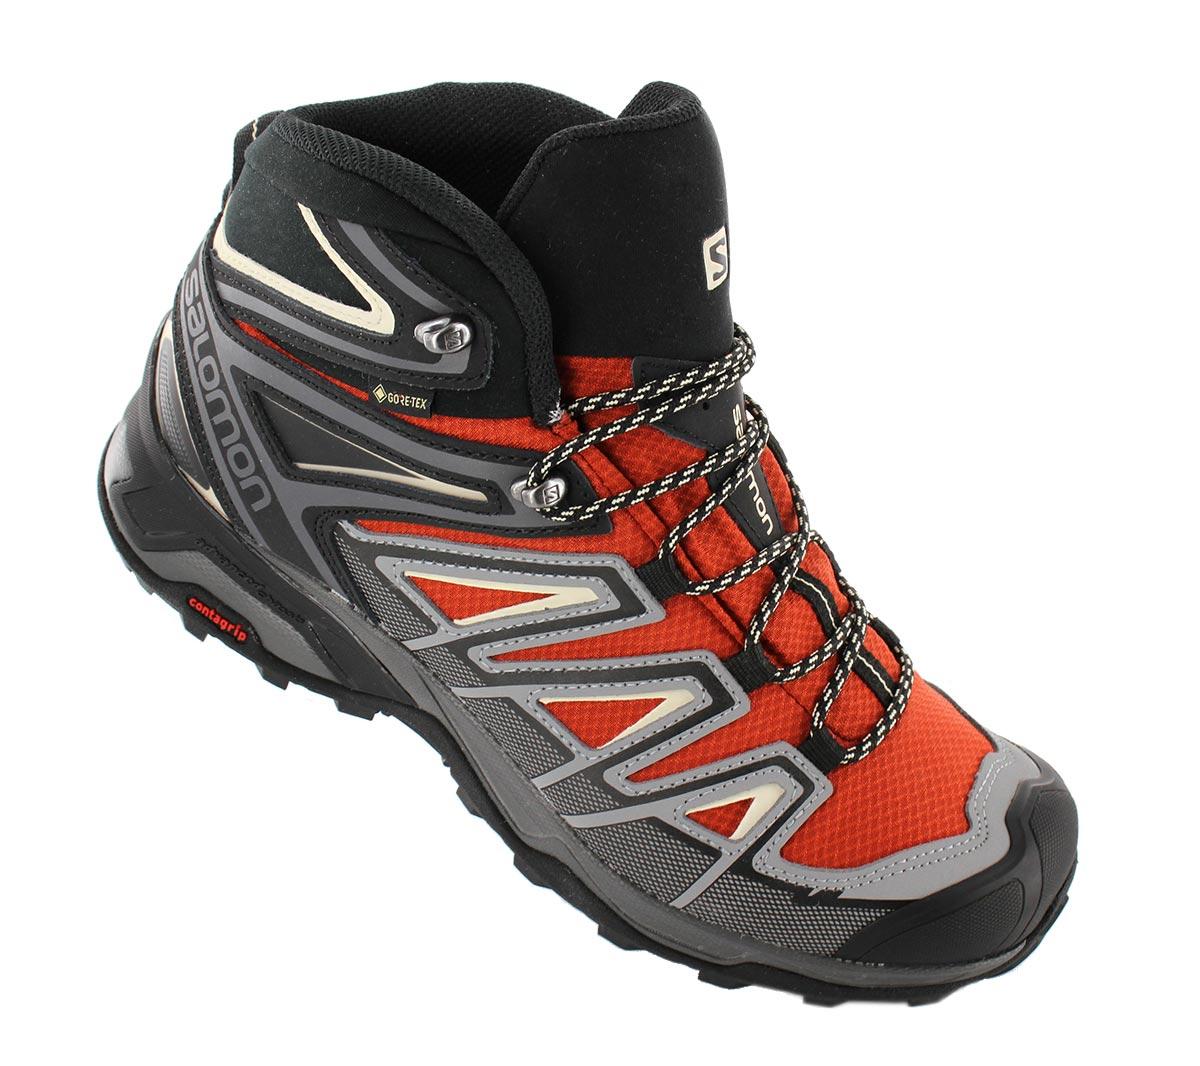 Details zu Salomon X ULTRA 3 MID GTX GORE TEX 409905 Herren Wanderschuhe Trekking Schuh qw5rW